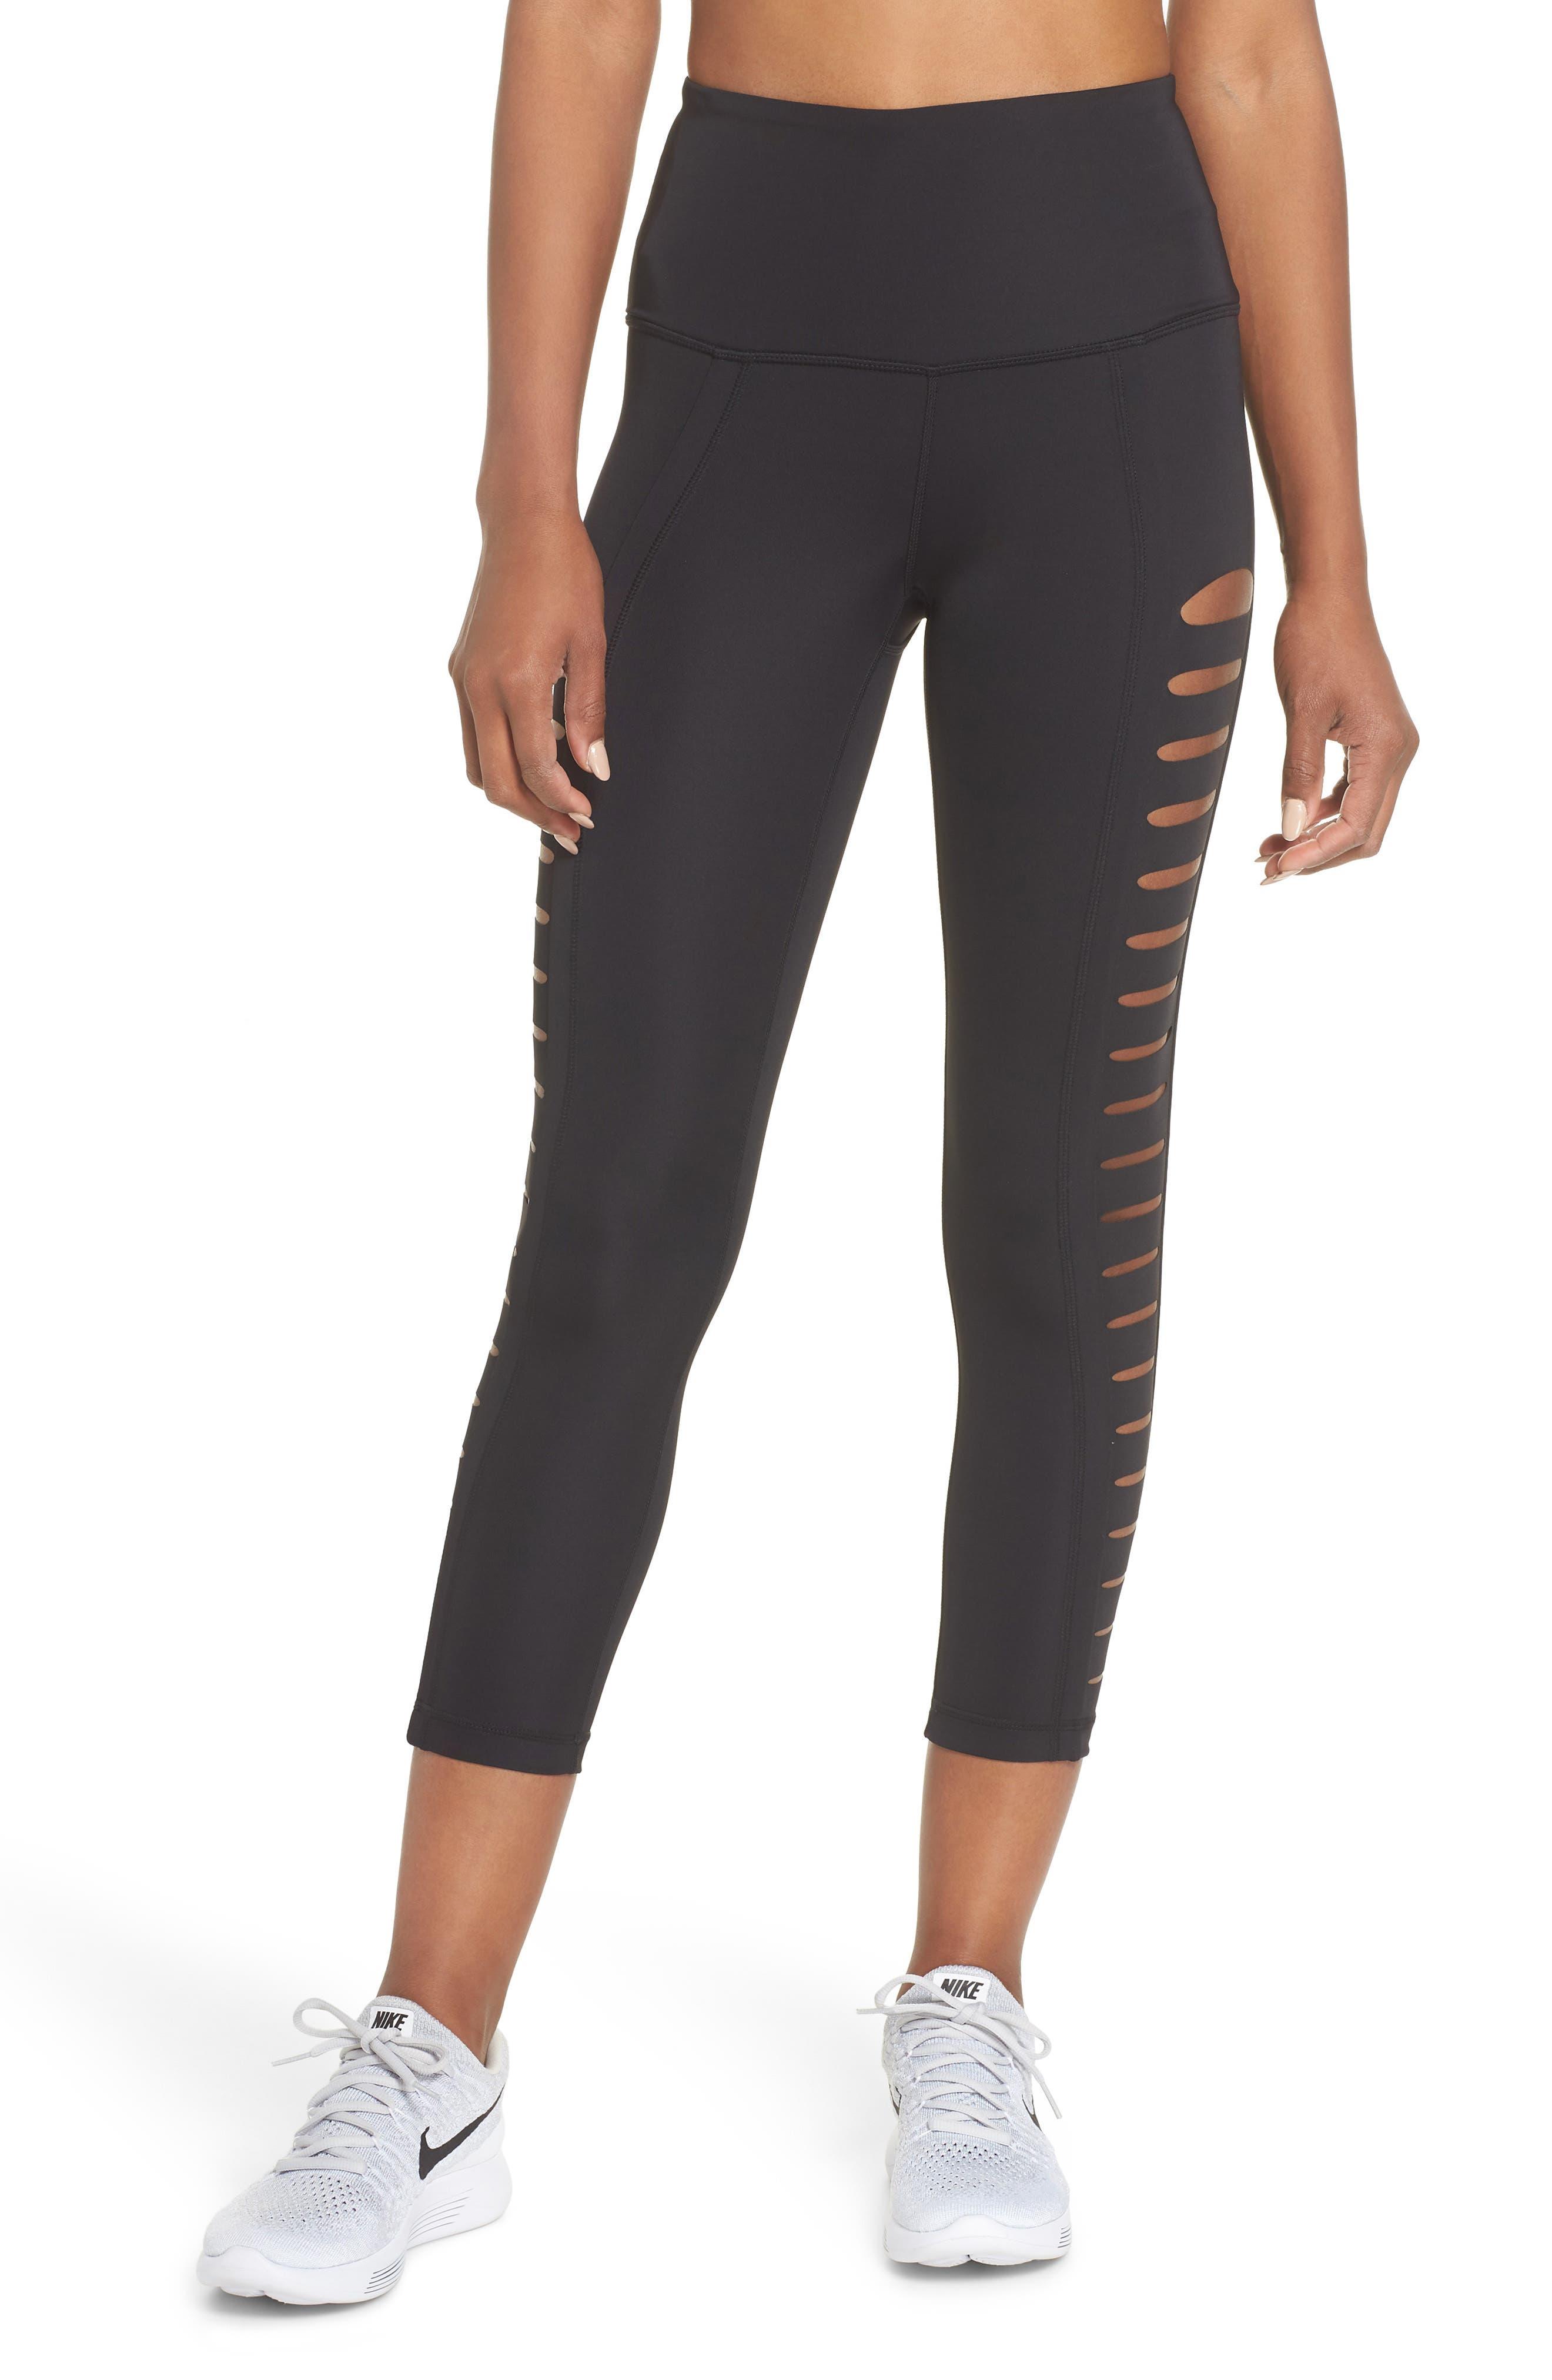 Intrigue High Waist Crop Leggings,                         Main,                         color, BLACK